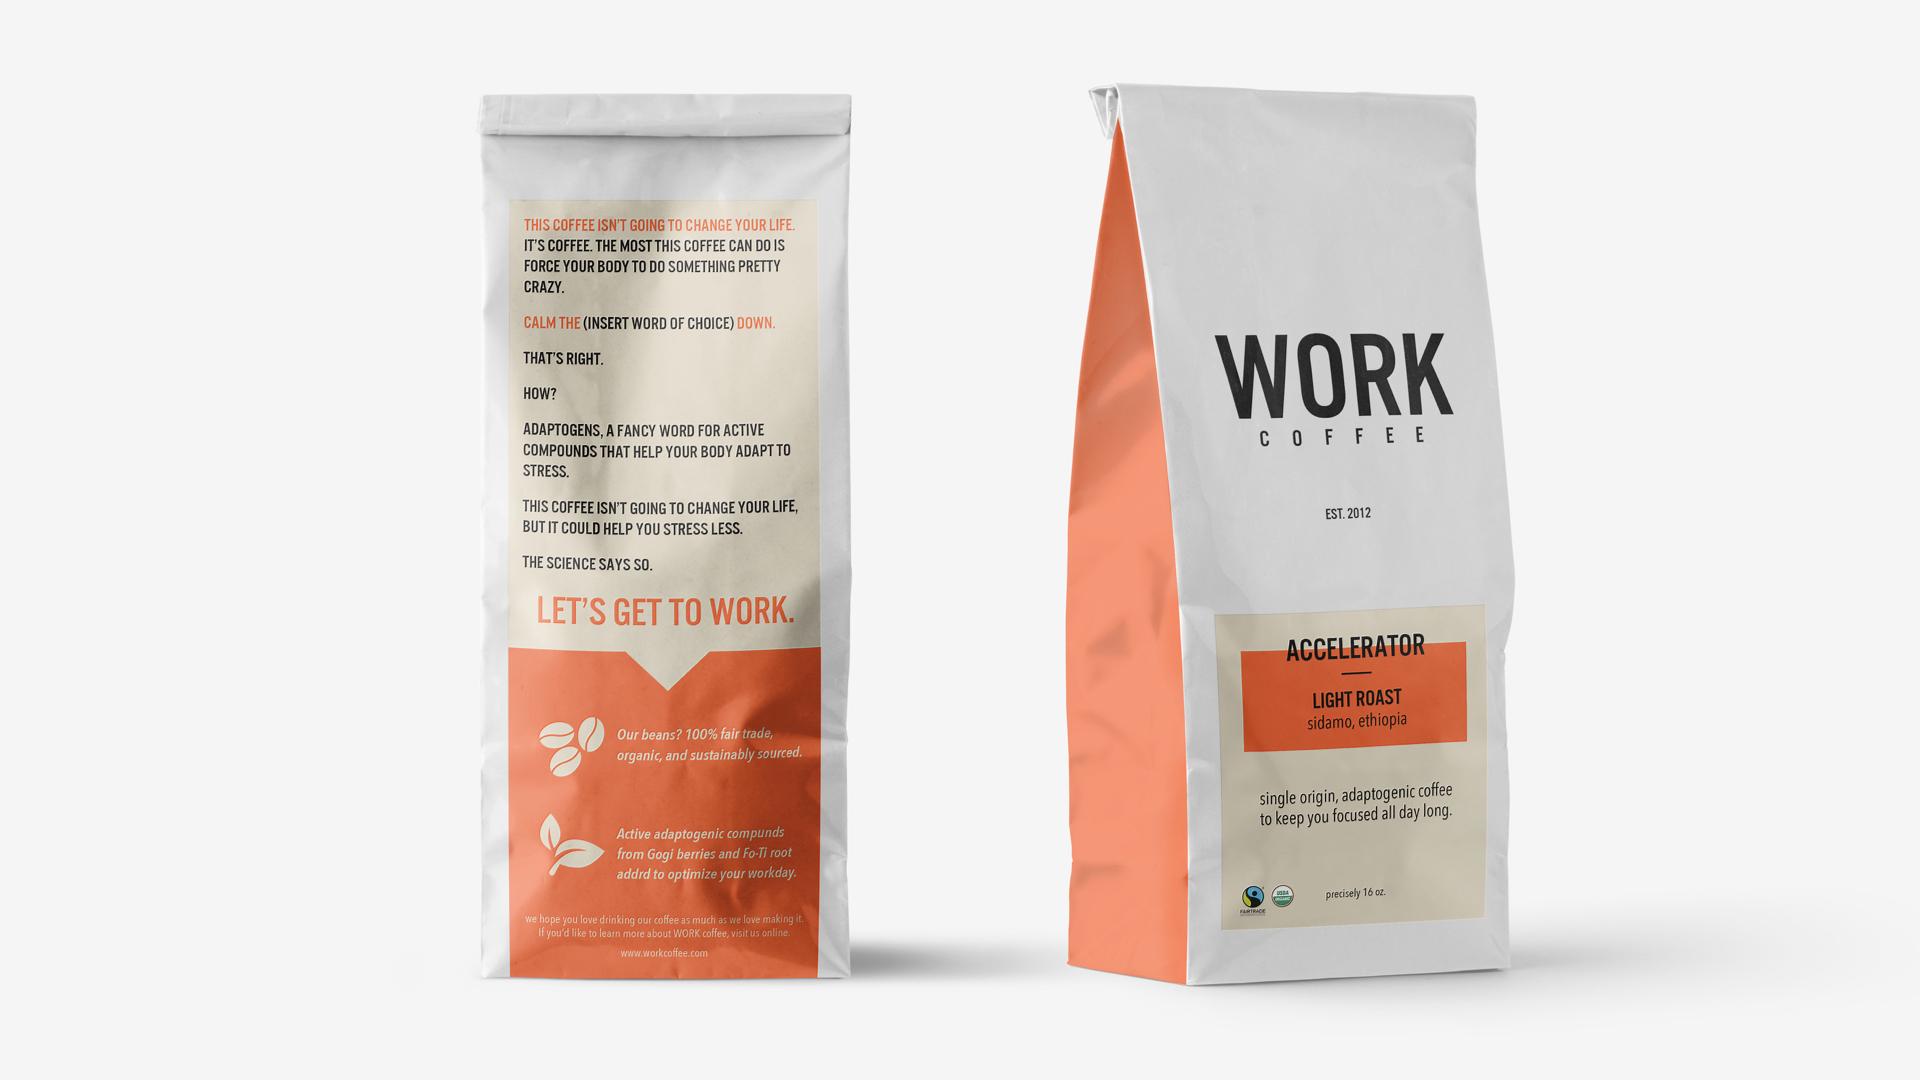 WORK COFFEE PRESENTATION FINAL.040.jpeg